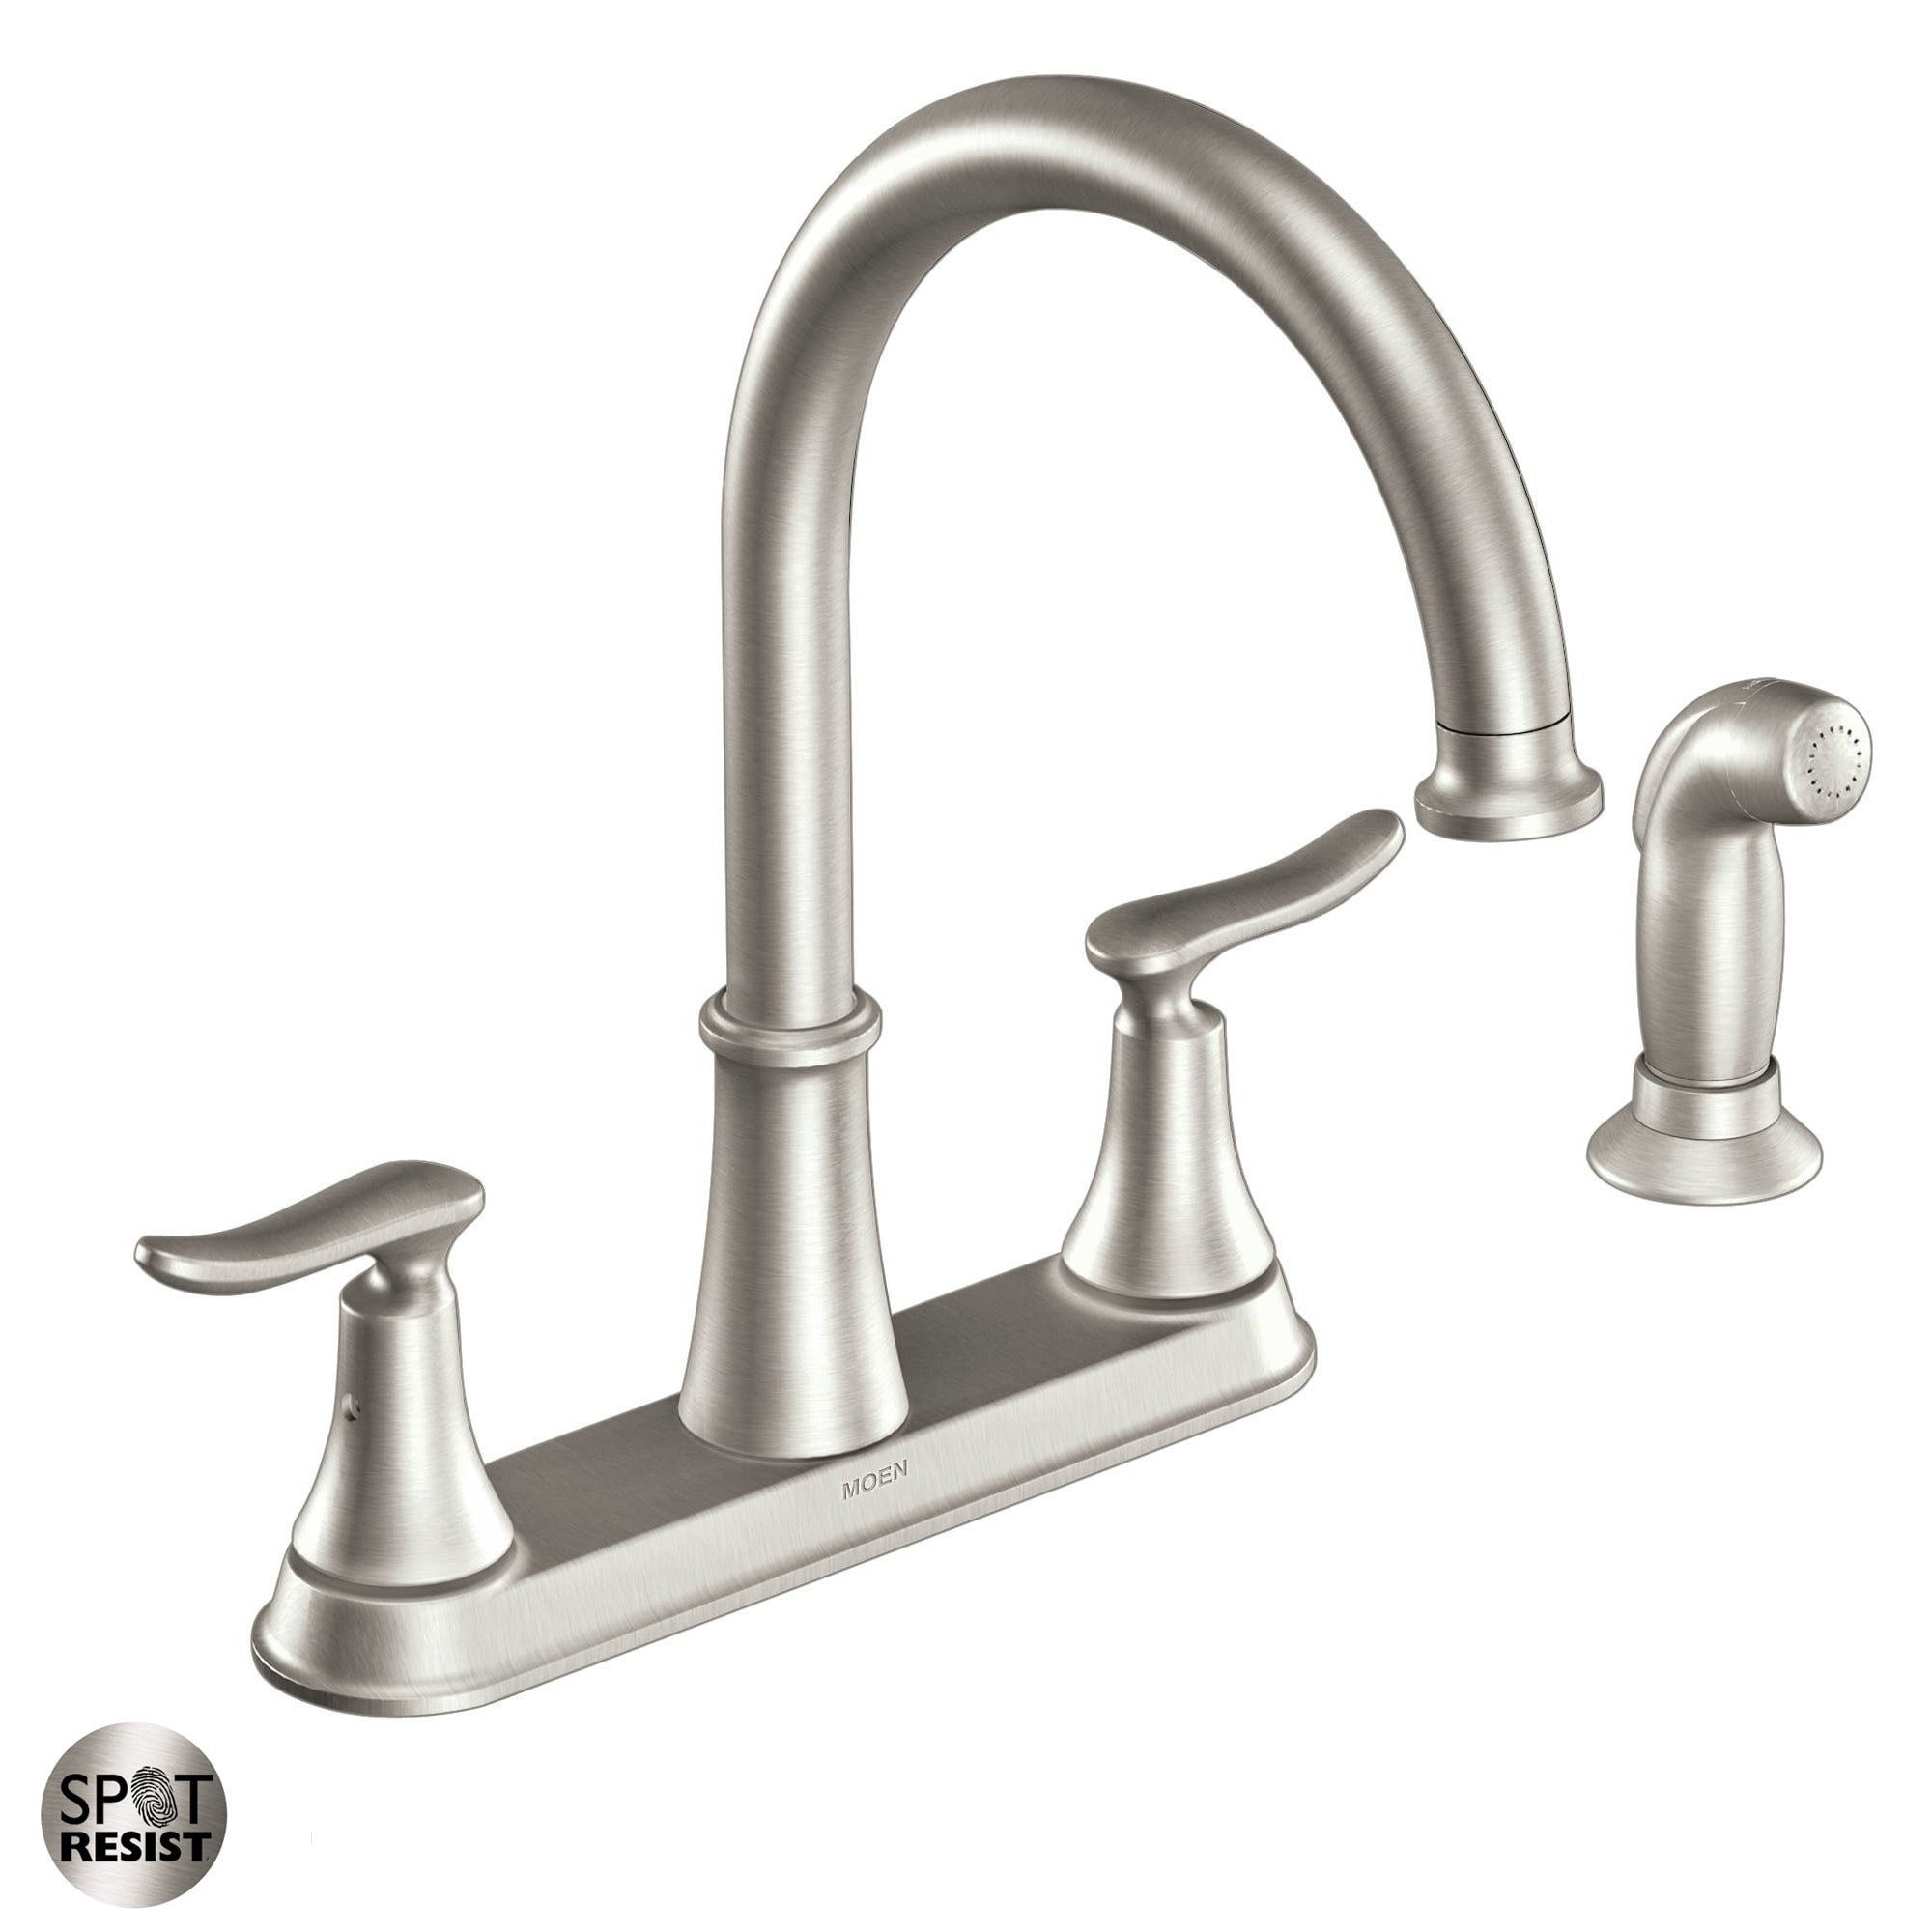 Moen Kaden Kitchen Faucet Kitchen Faucets